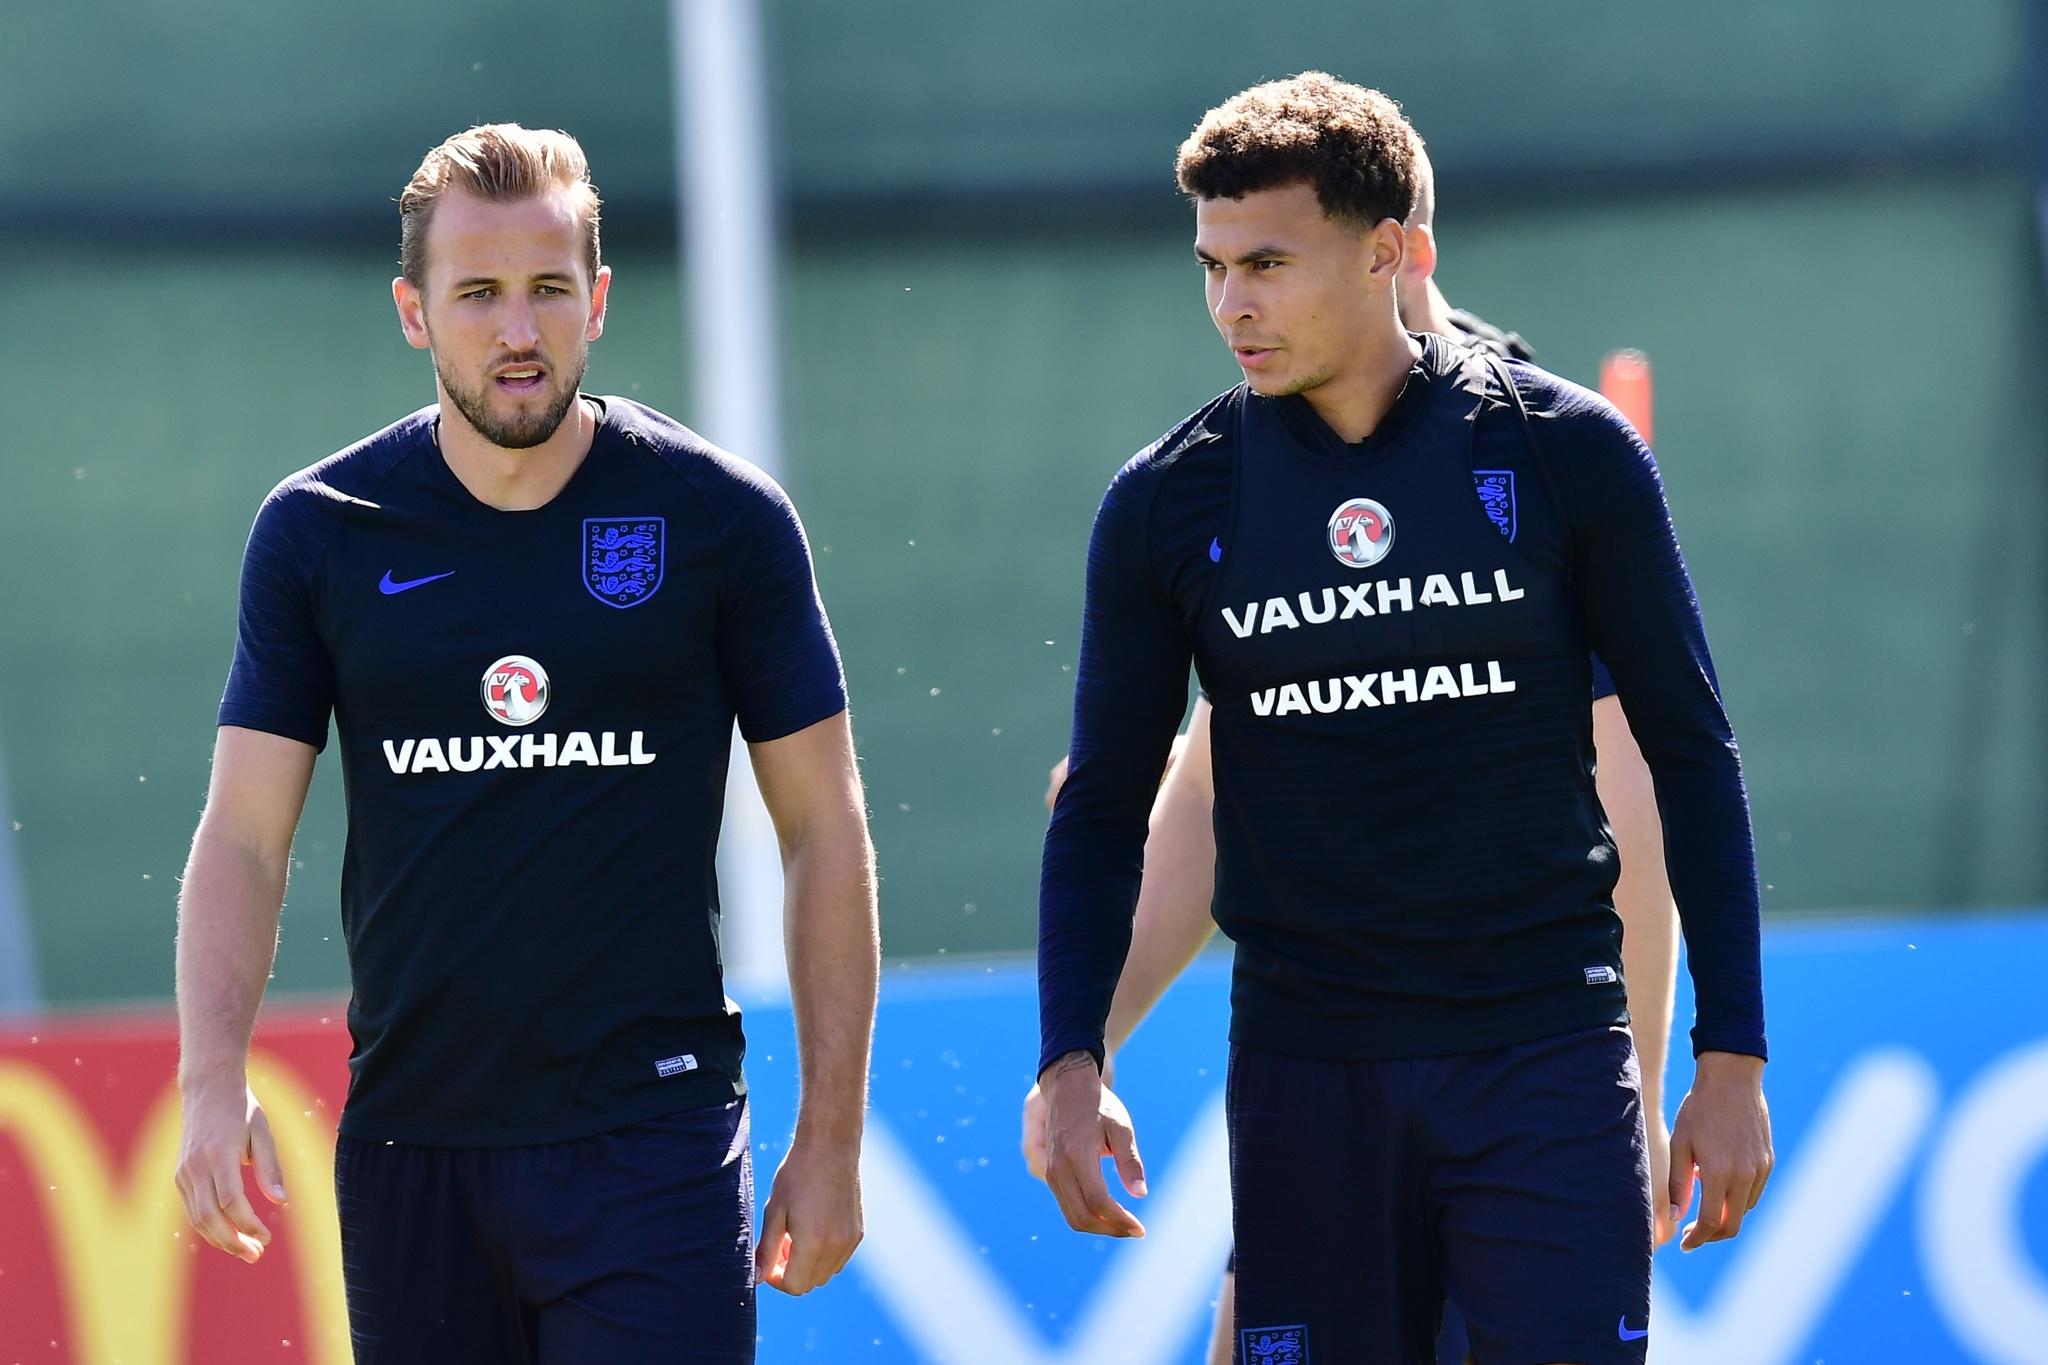 Ve capitán de Colombia favoritismo en arbitraje ante Inglaterra